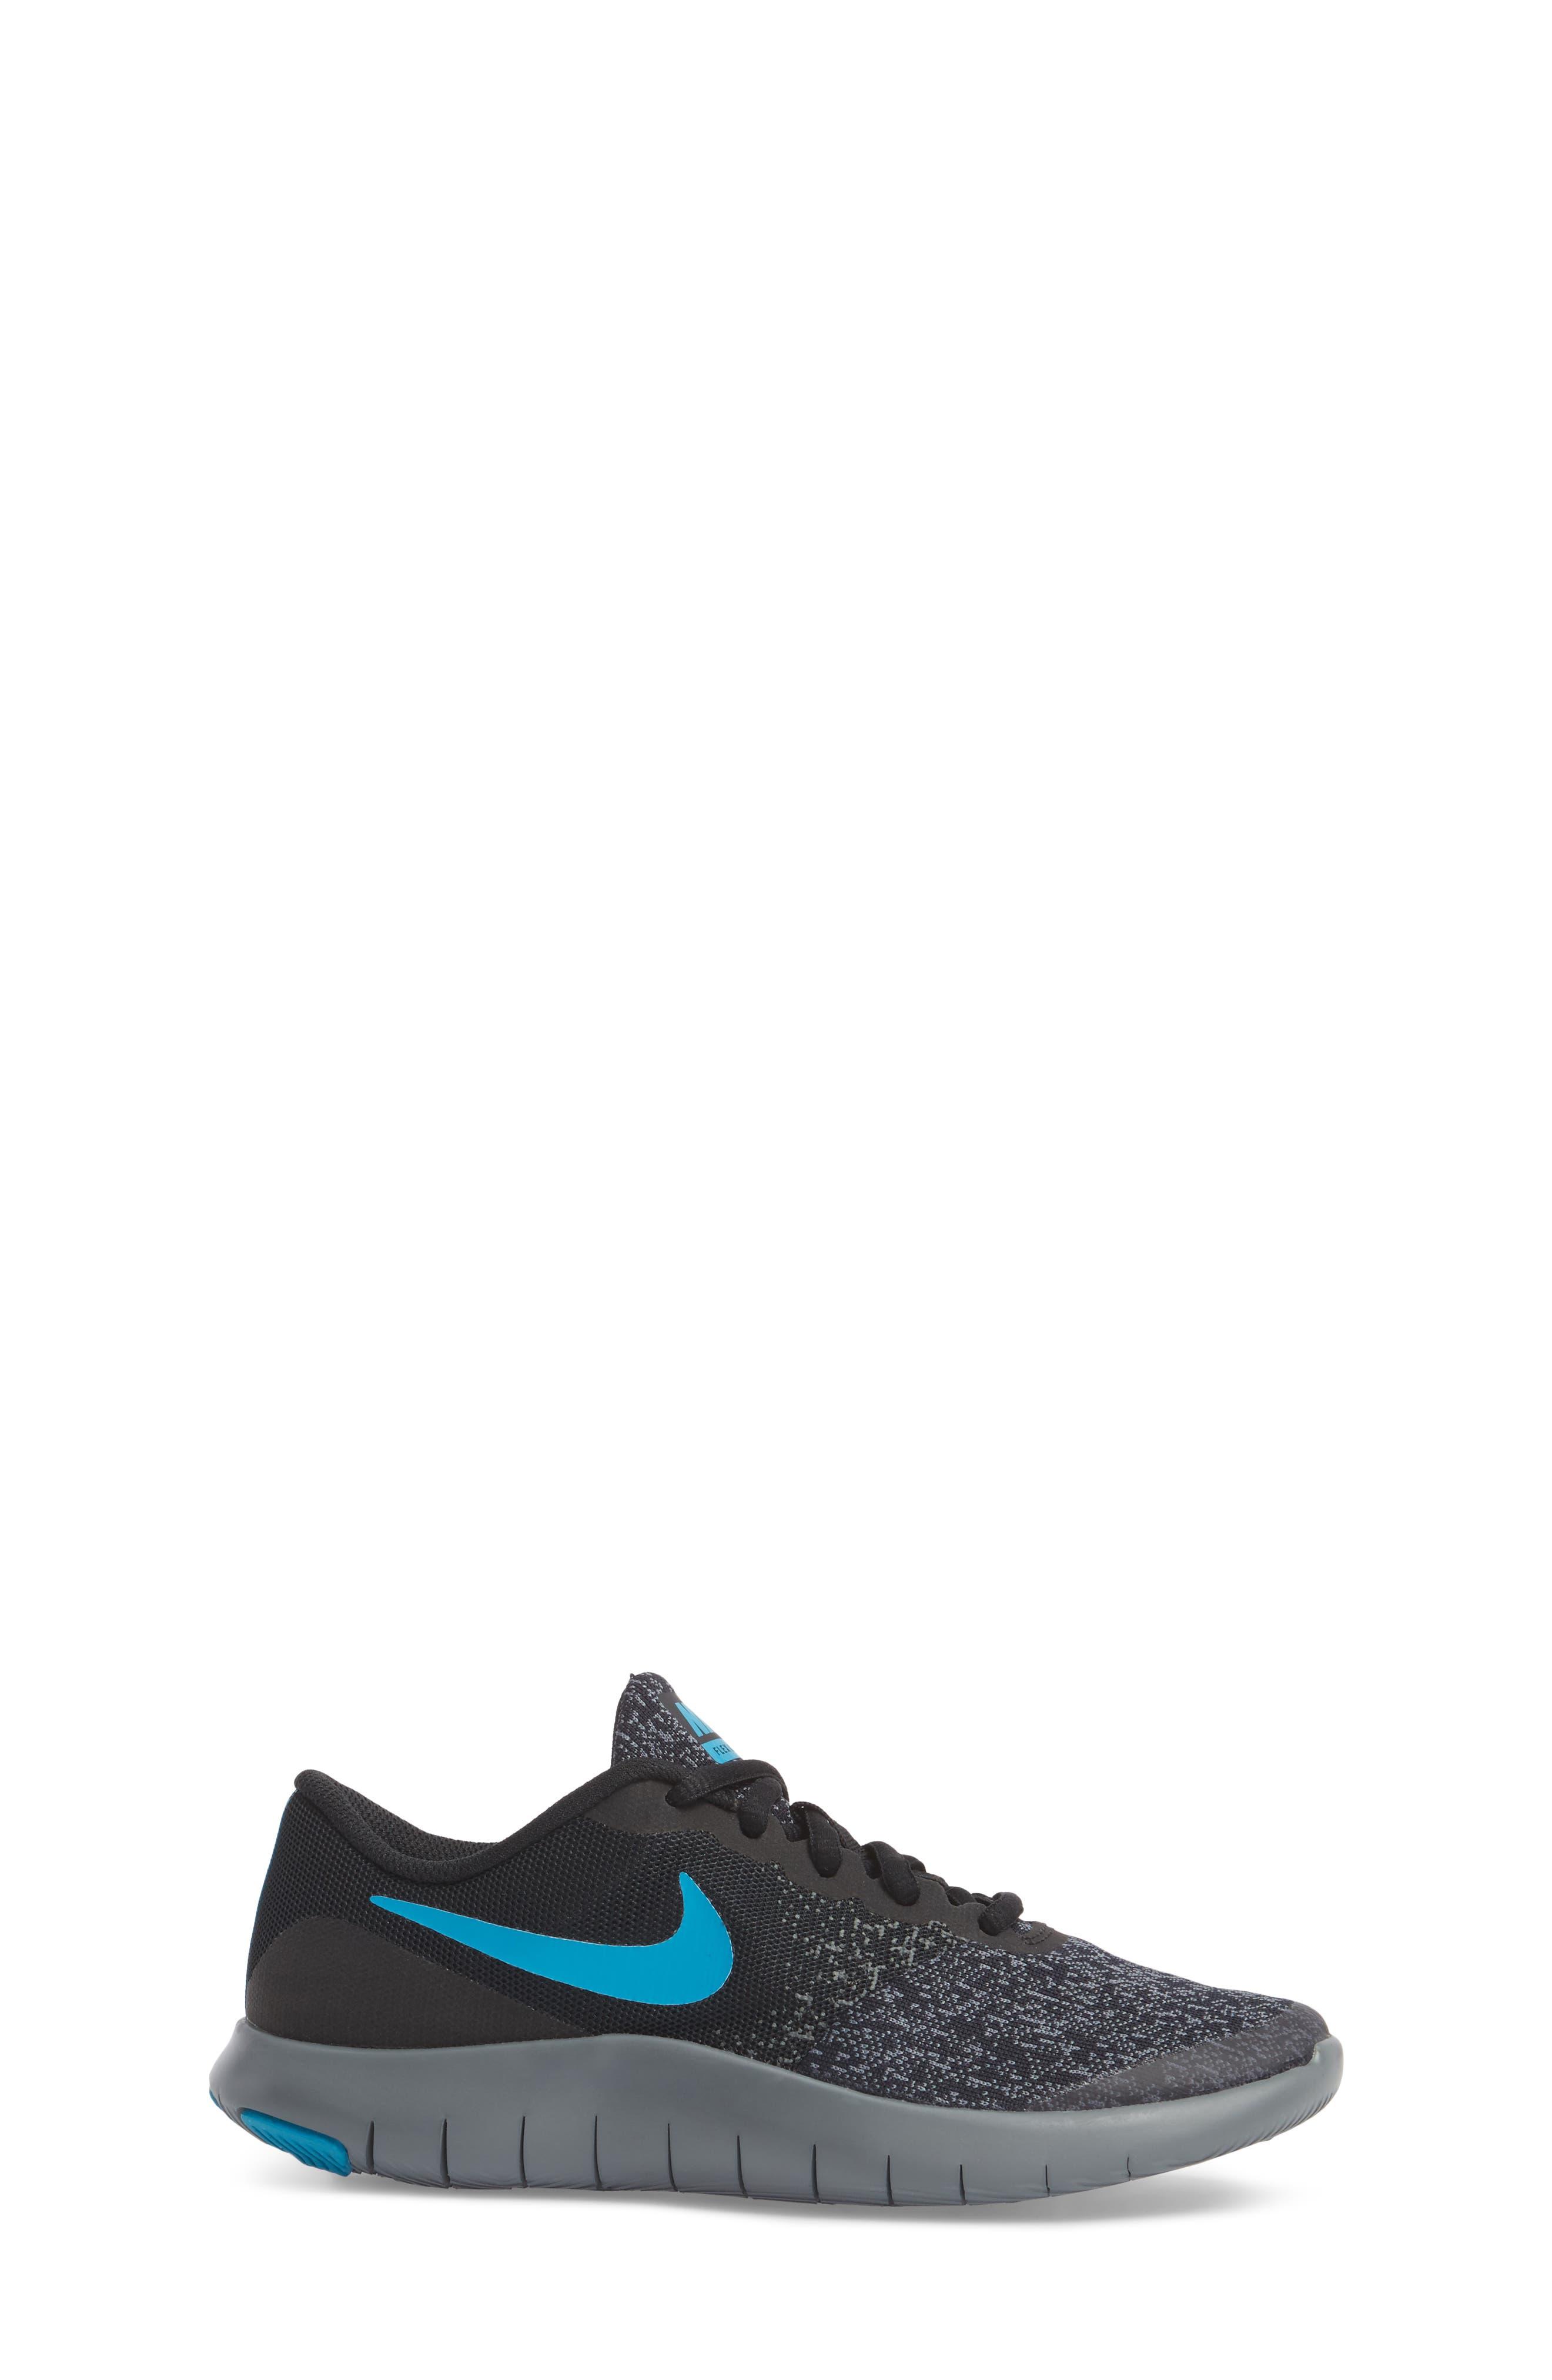 Flex Contact Running Shoe,                             Alternate thumbnail 3, color,                             007